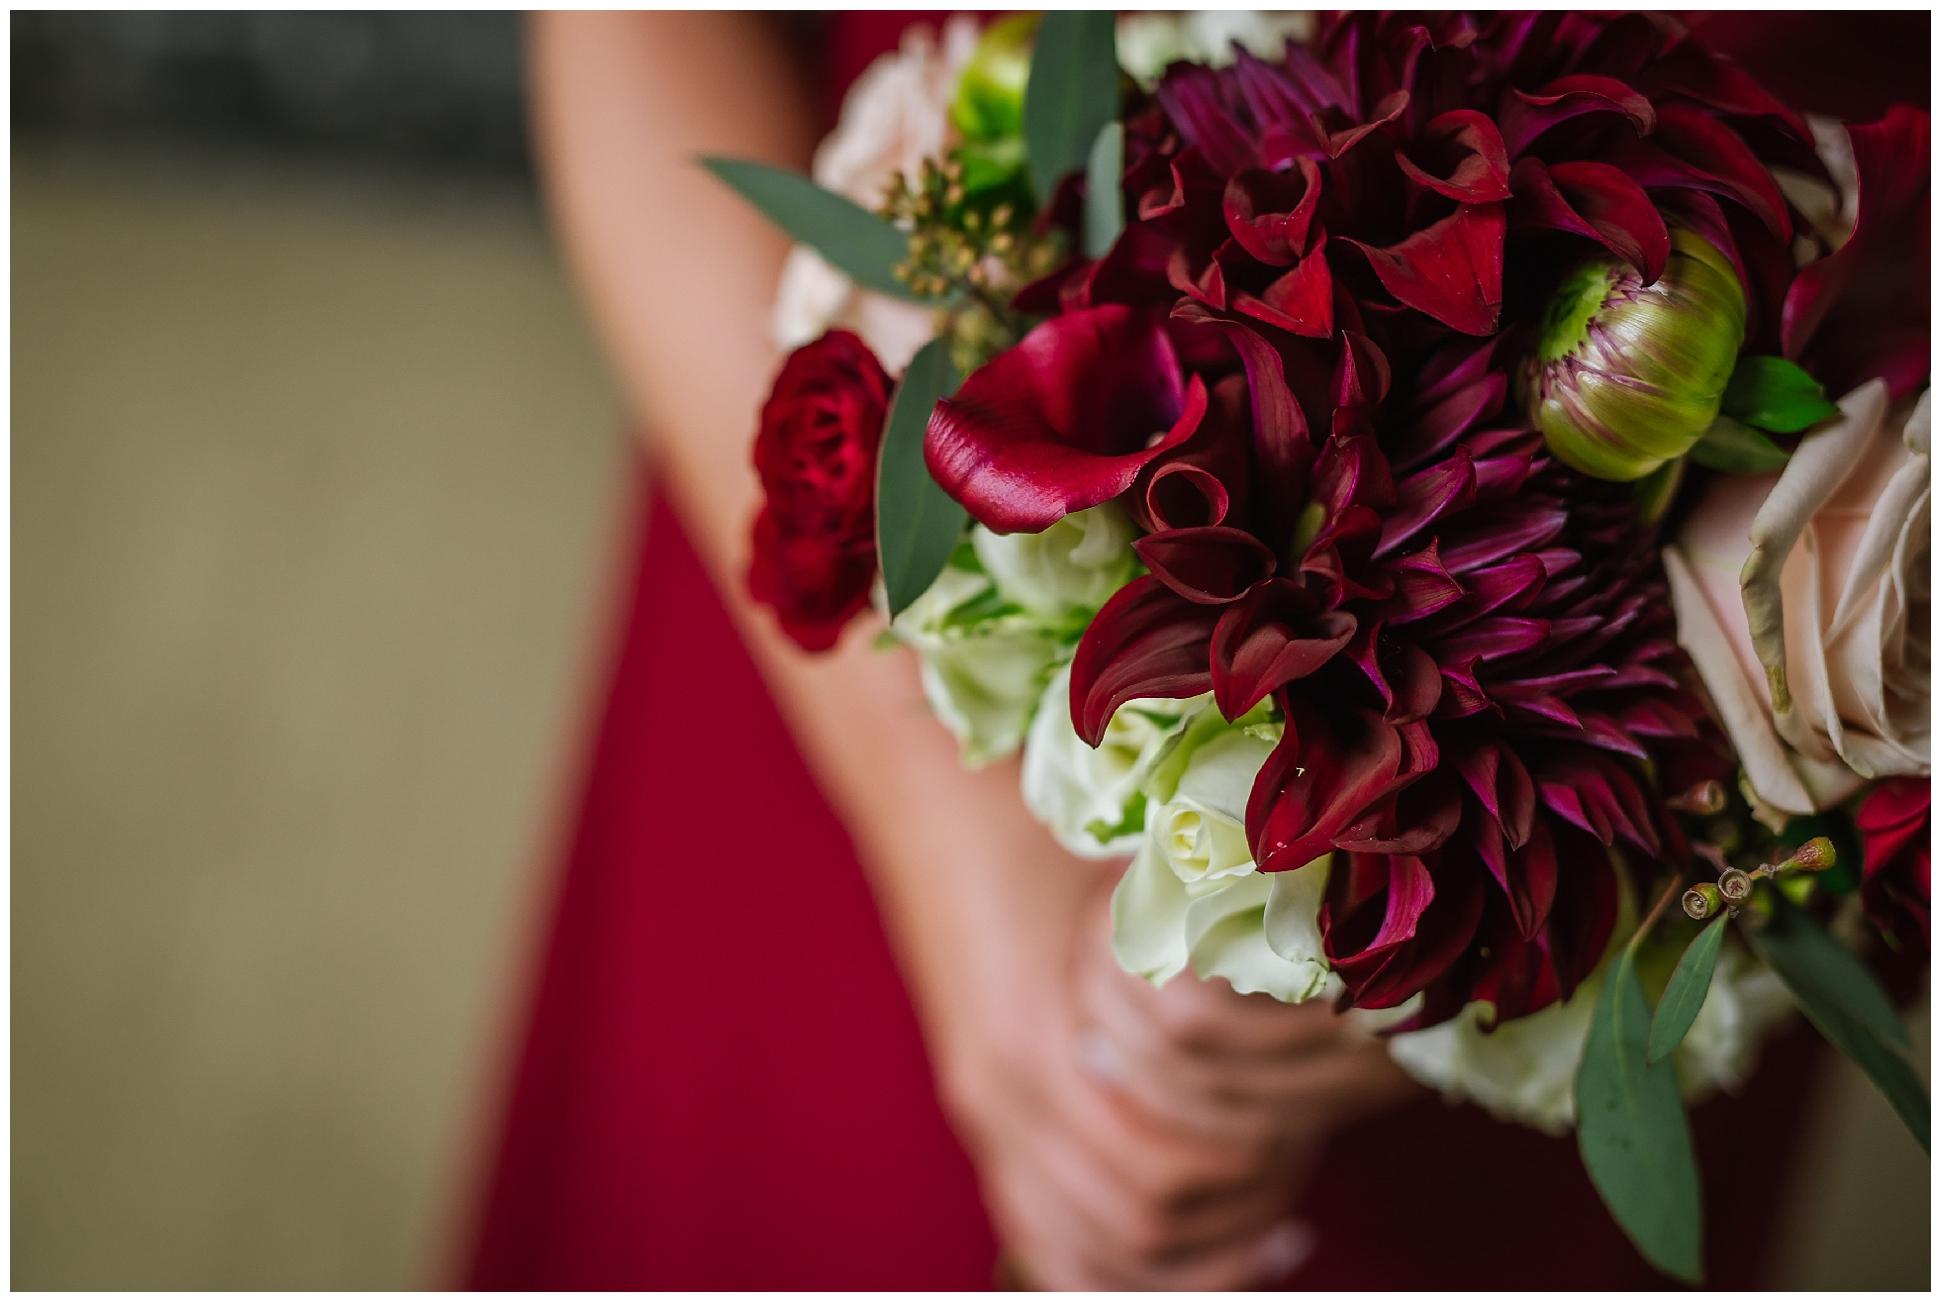 Oxford-exchange-wedding-photogapher-garland-candels-bookstore-burgandy-botanica_0012.jpg